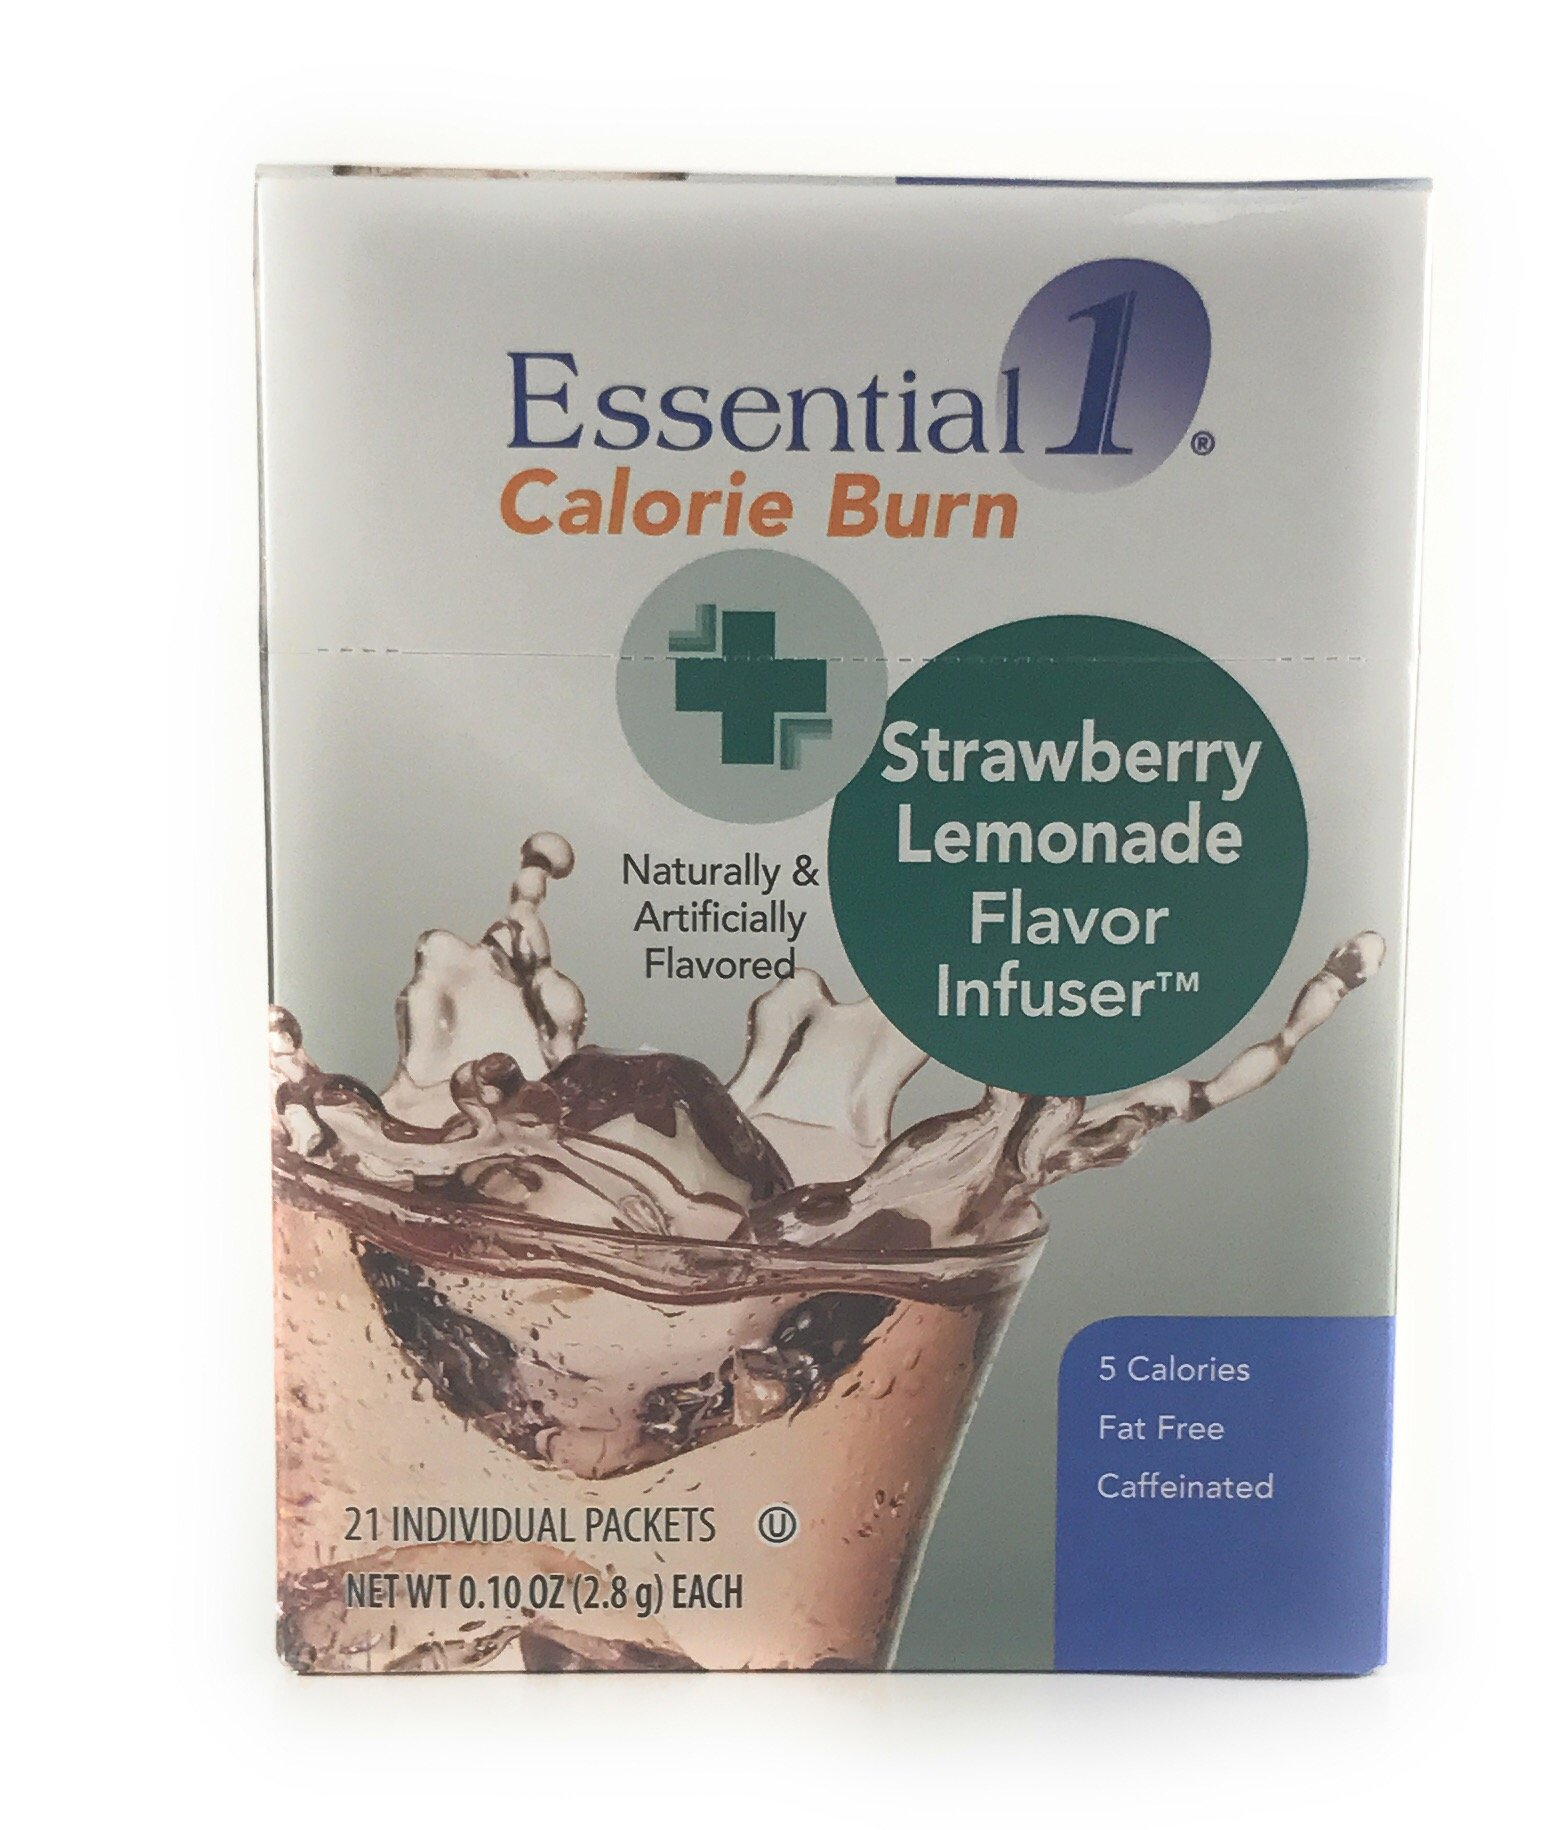 Medifast Essential1: Calorie Burn Strawberry Lemonade Flavor Infuser (1 Box/21 Servings) by Medifast (Image #1)